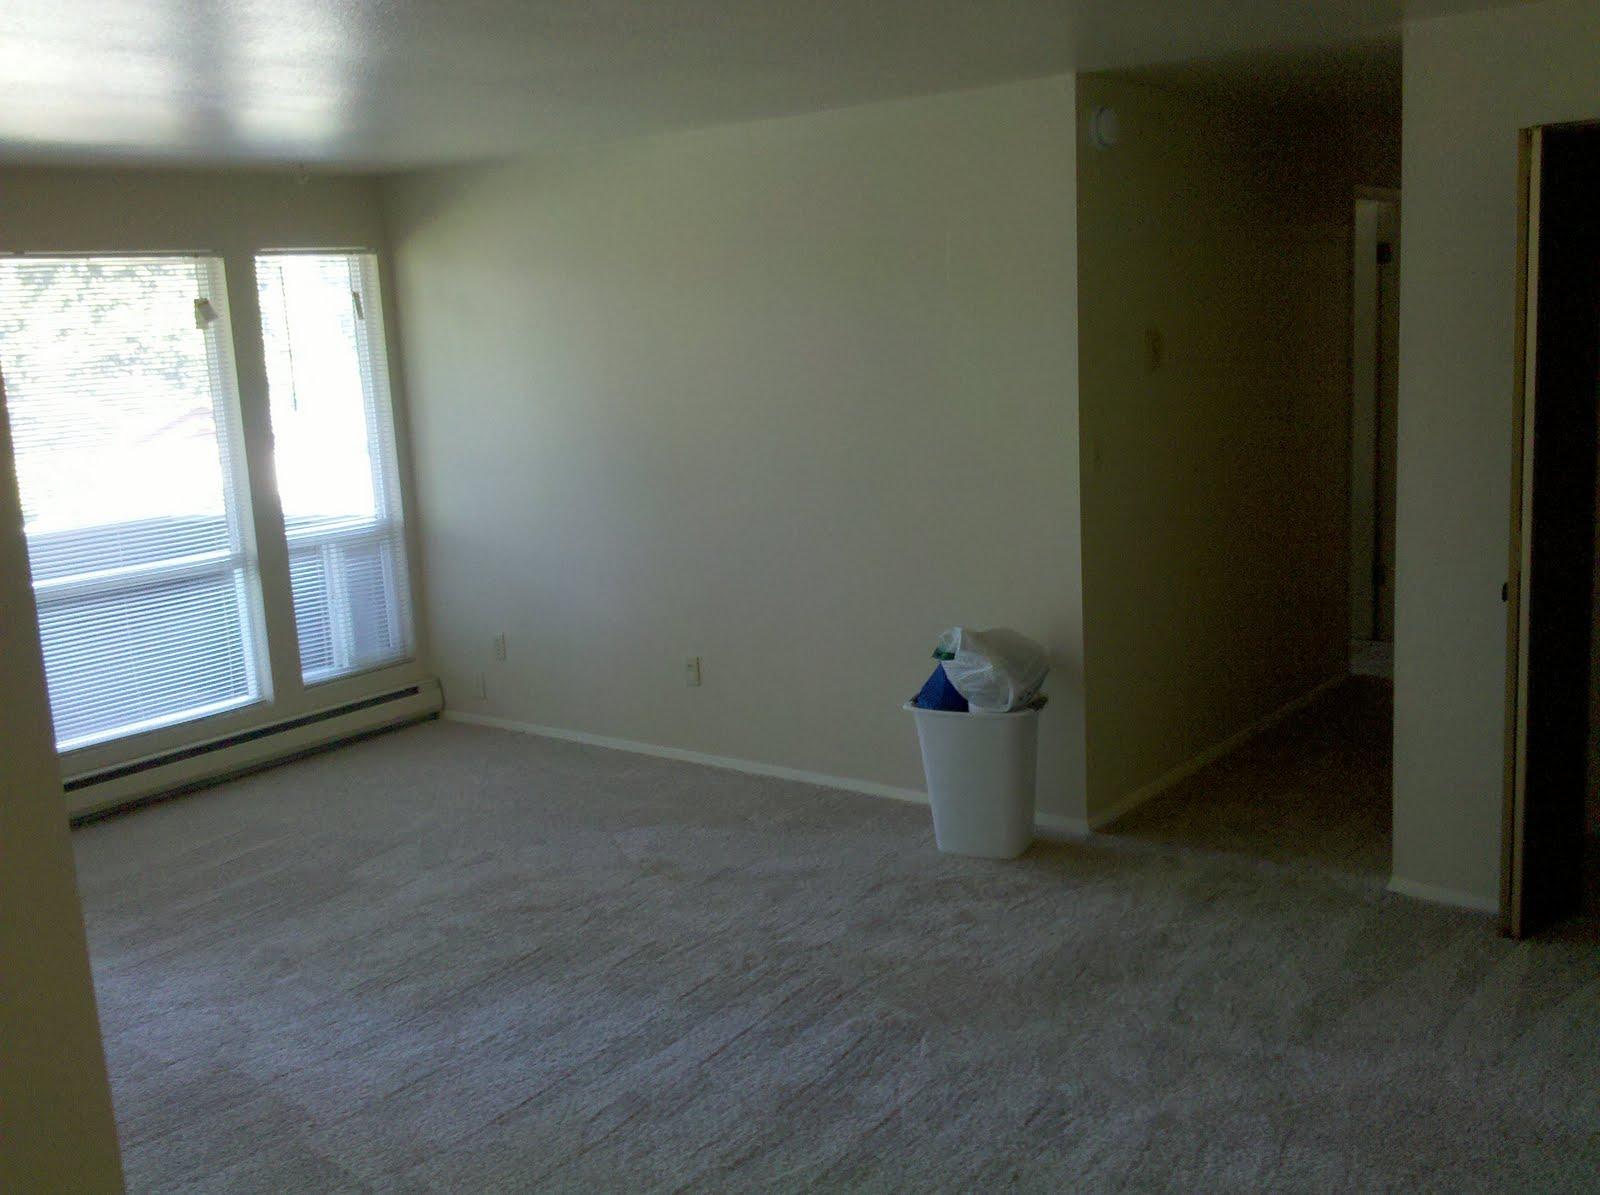 Adventures in Seattle Empty Apartment